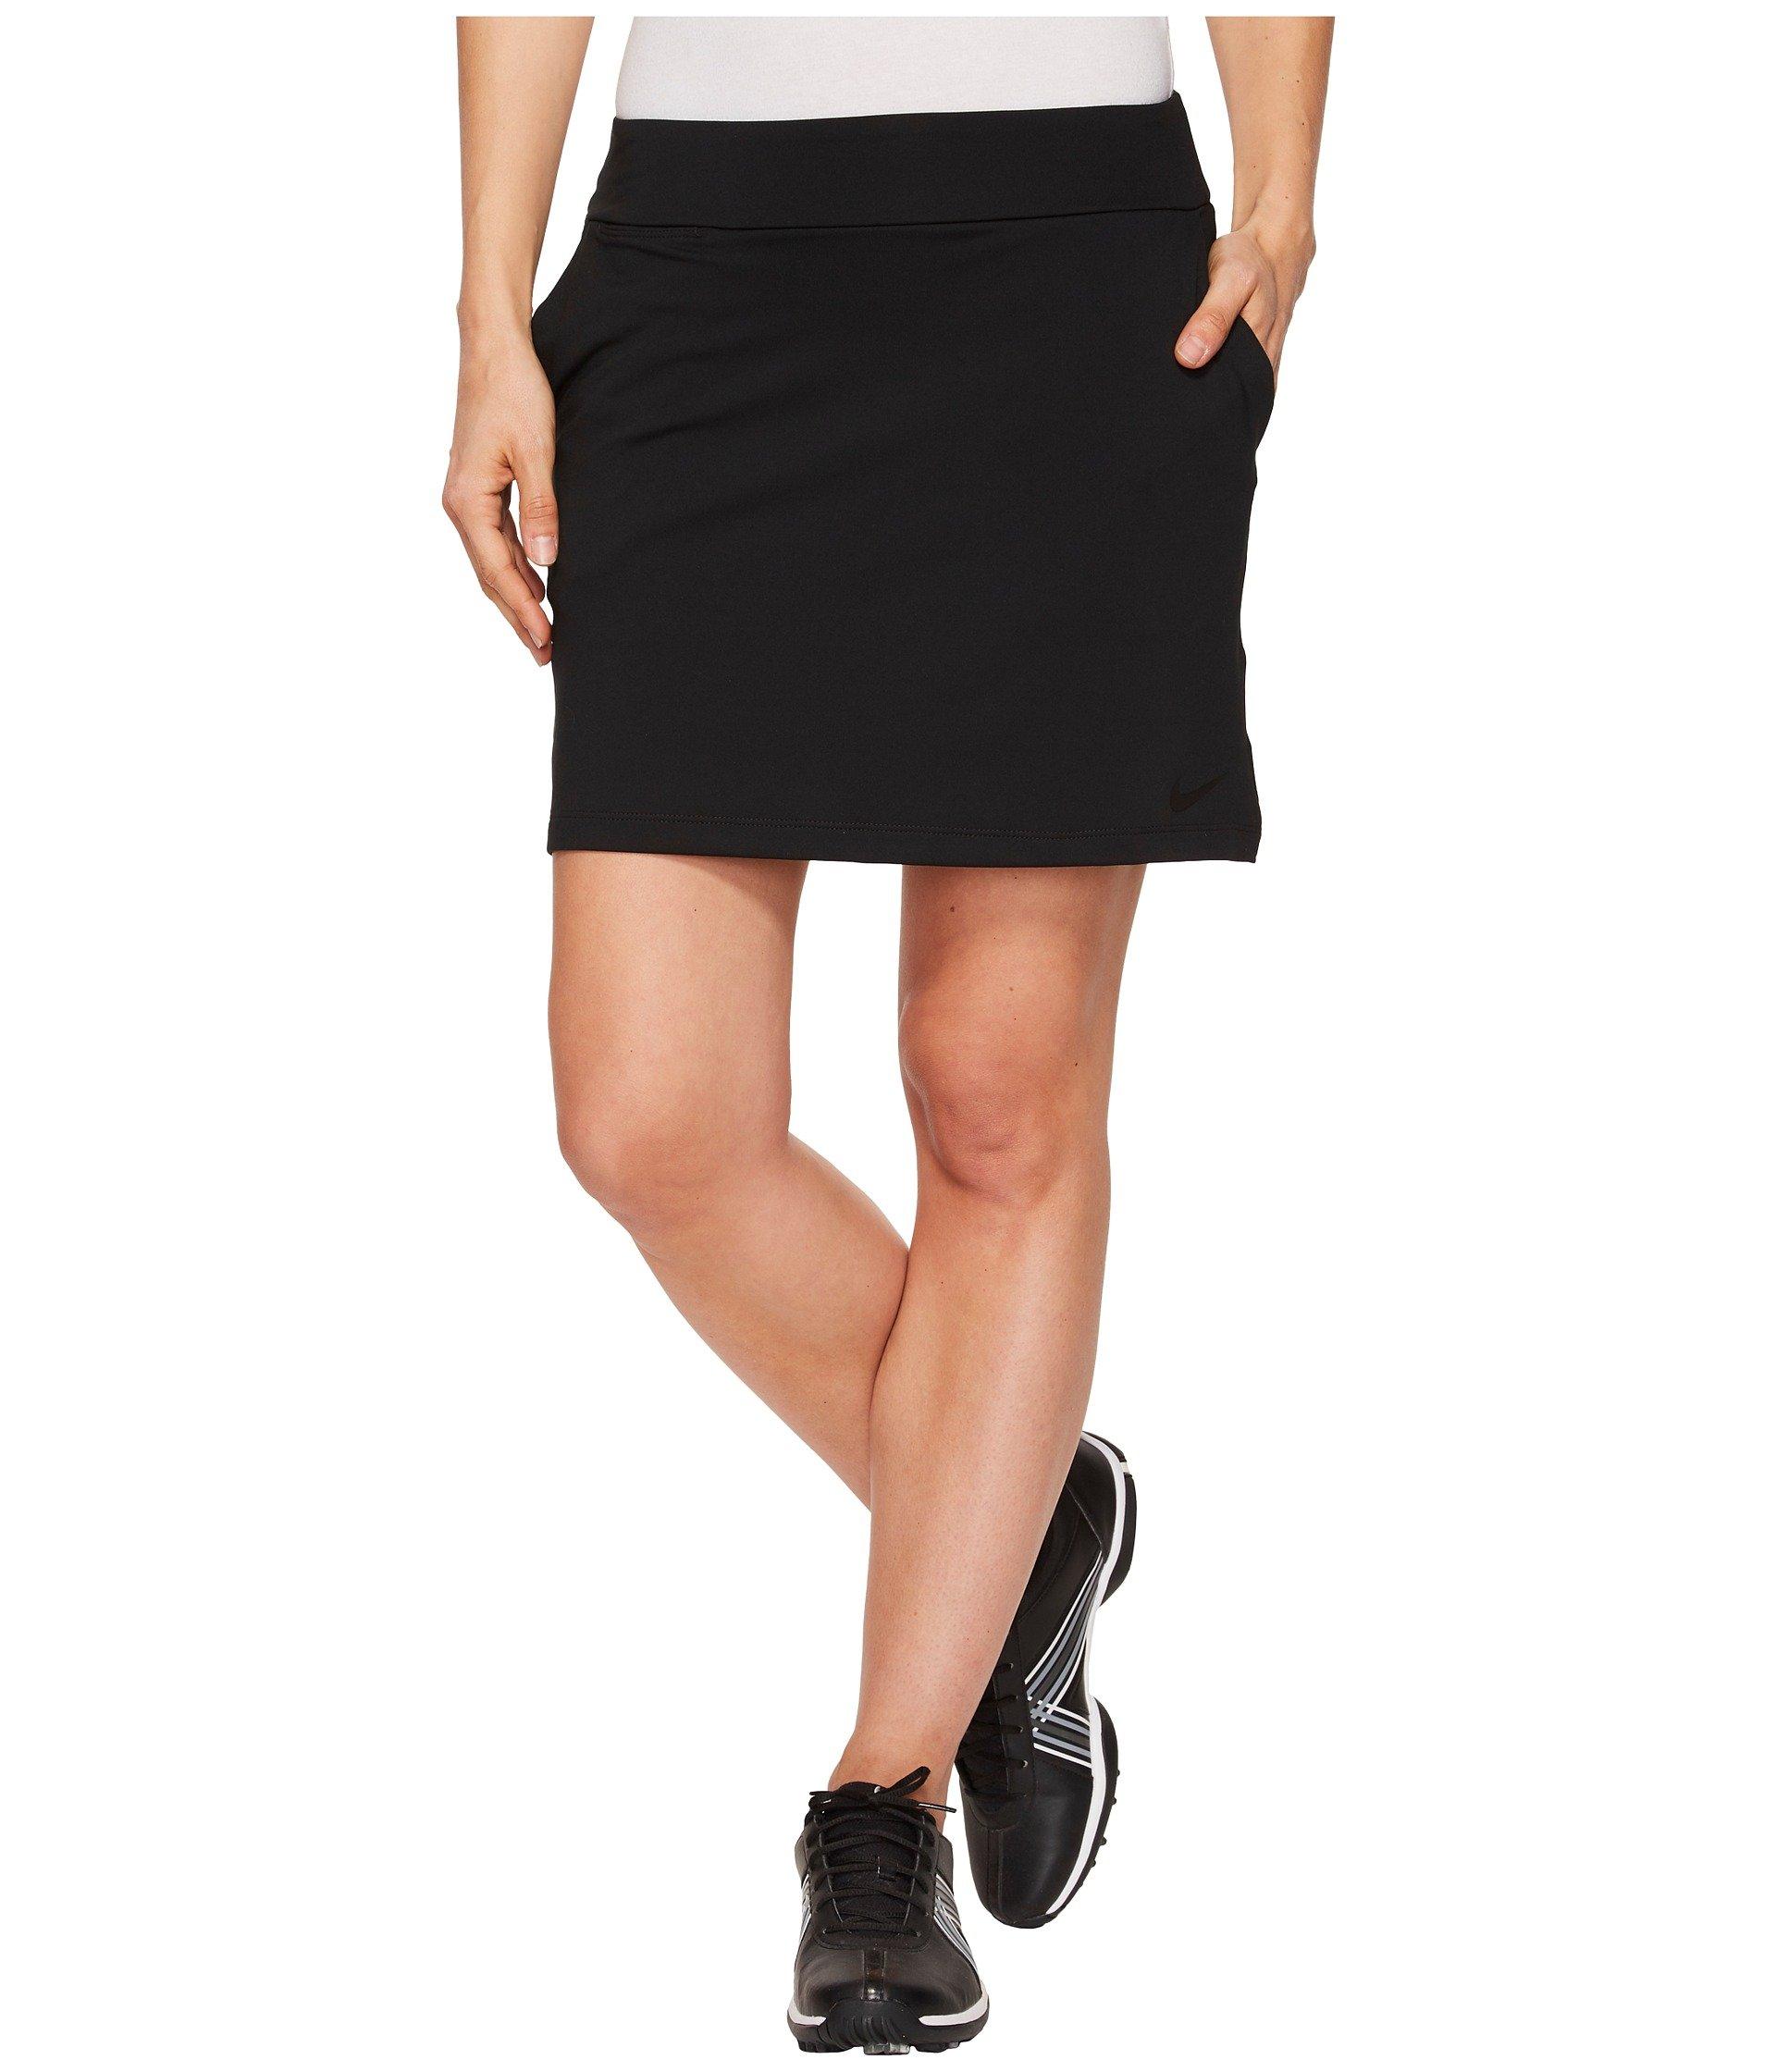 NIKE Women's Dry Golf Skort, Black/Black, Large by Nike